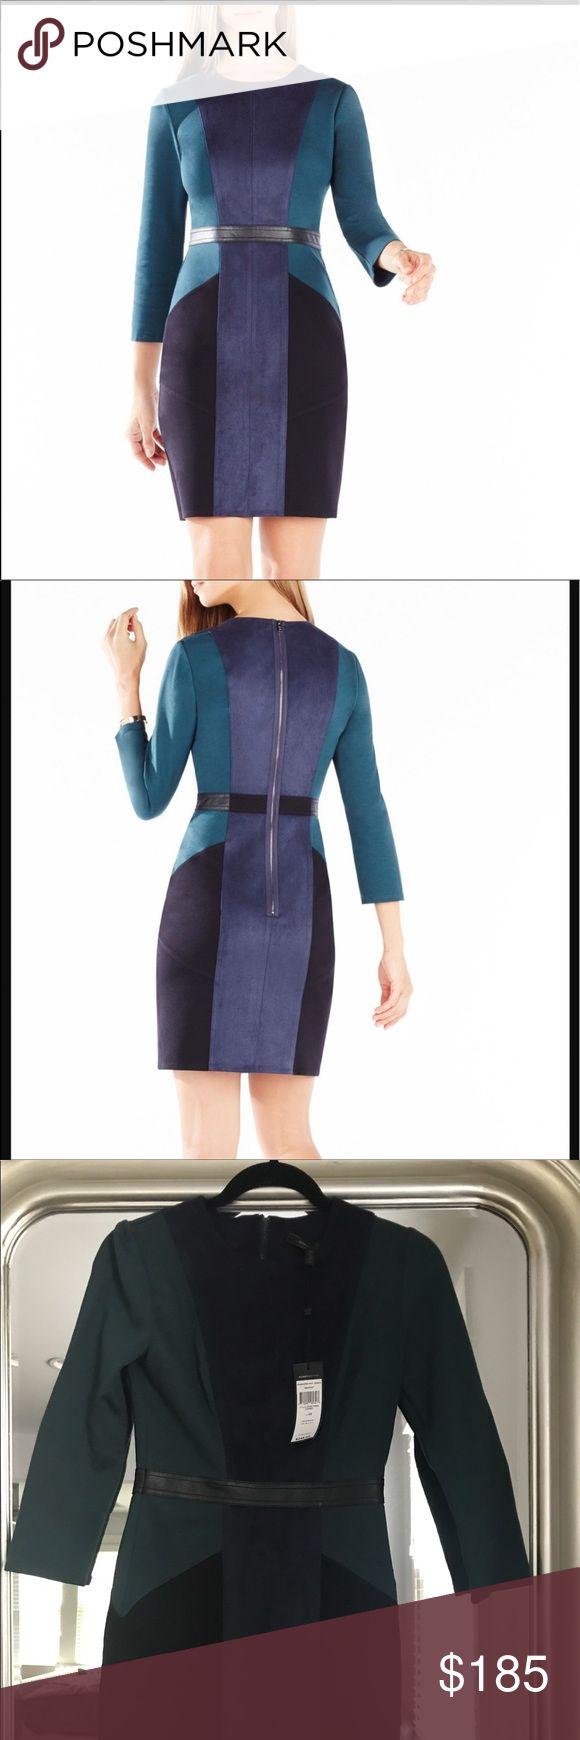 Selling this Beatriz Color-Blocked Faux-Suede Dress on Poshmark! My username is: csauer85. #shopmycloset #poshmark #fashion #shopping #style #forsale #BCBGMaxAzria #Dresses & Skirts